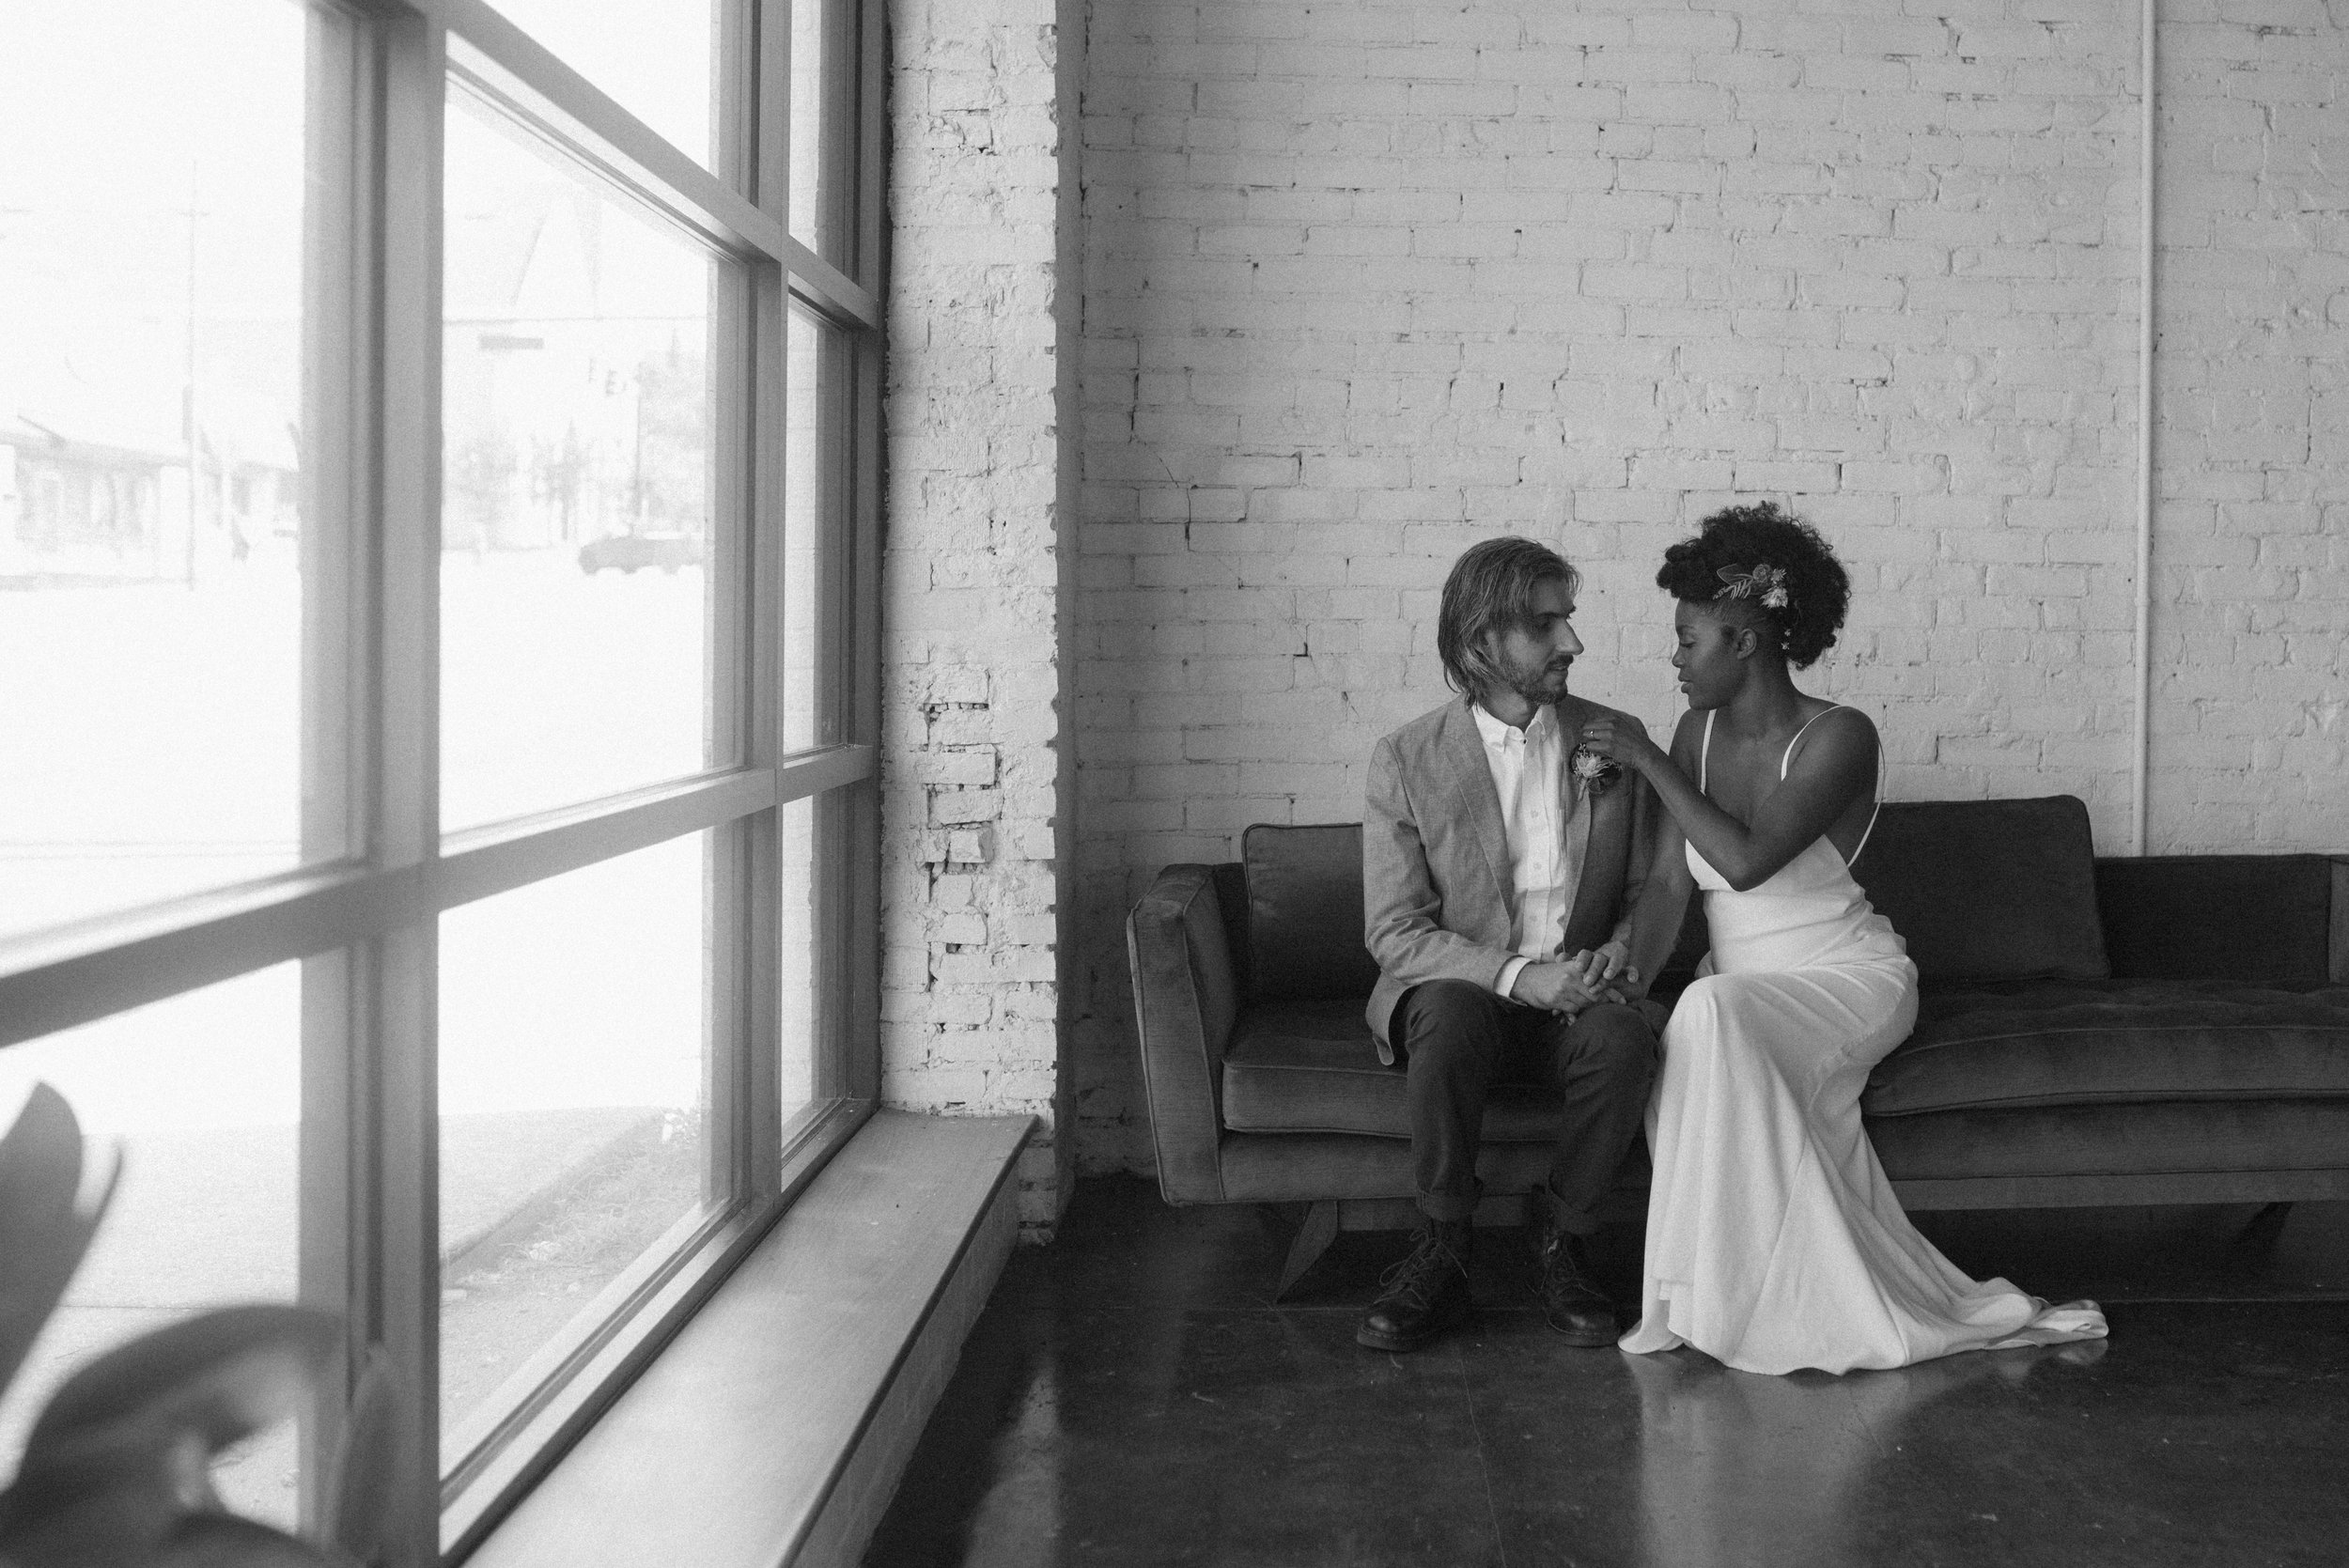 haus-820-minimal-editorial-wedding-styled-shoot-5.jpg